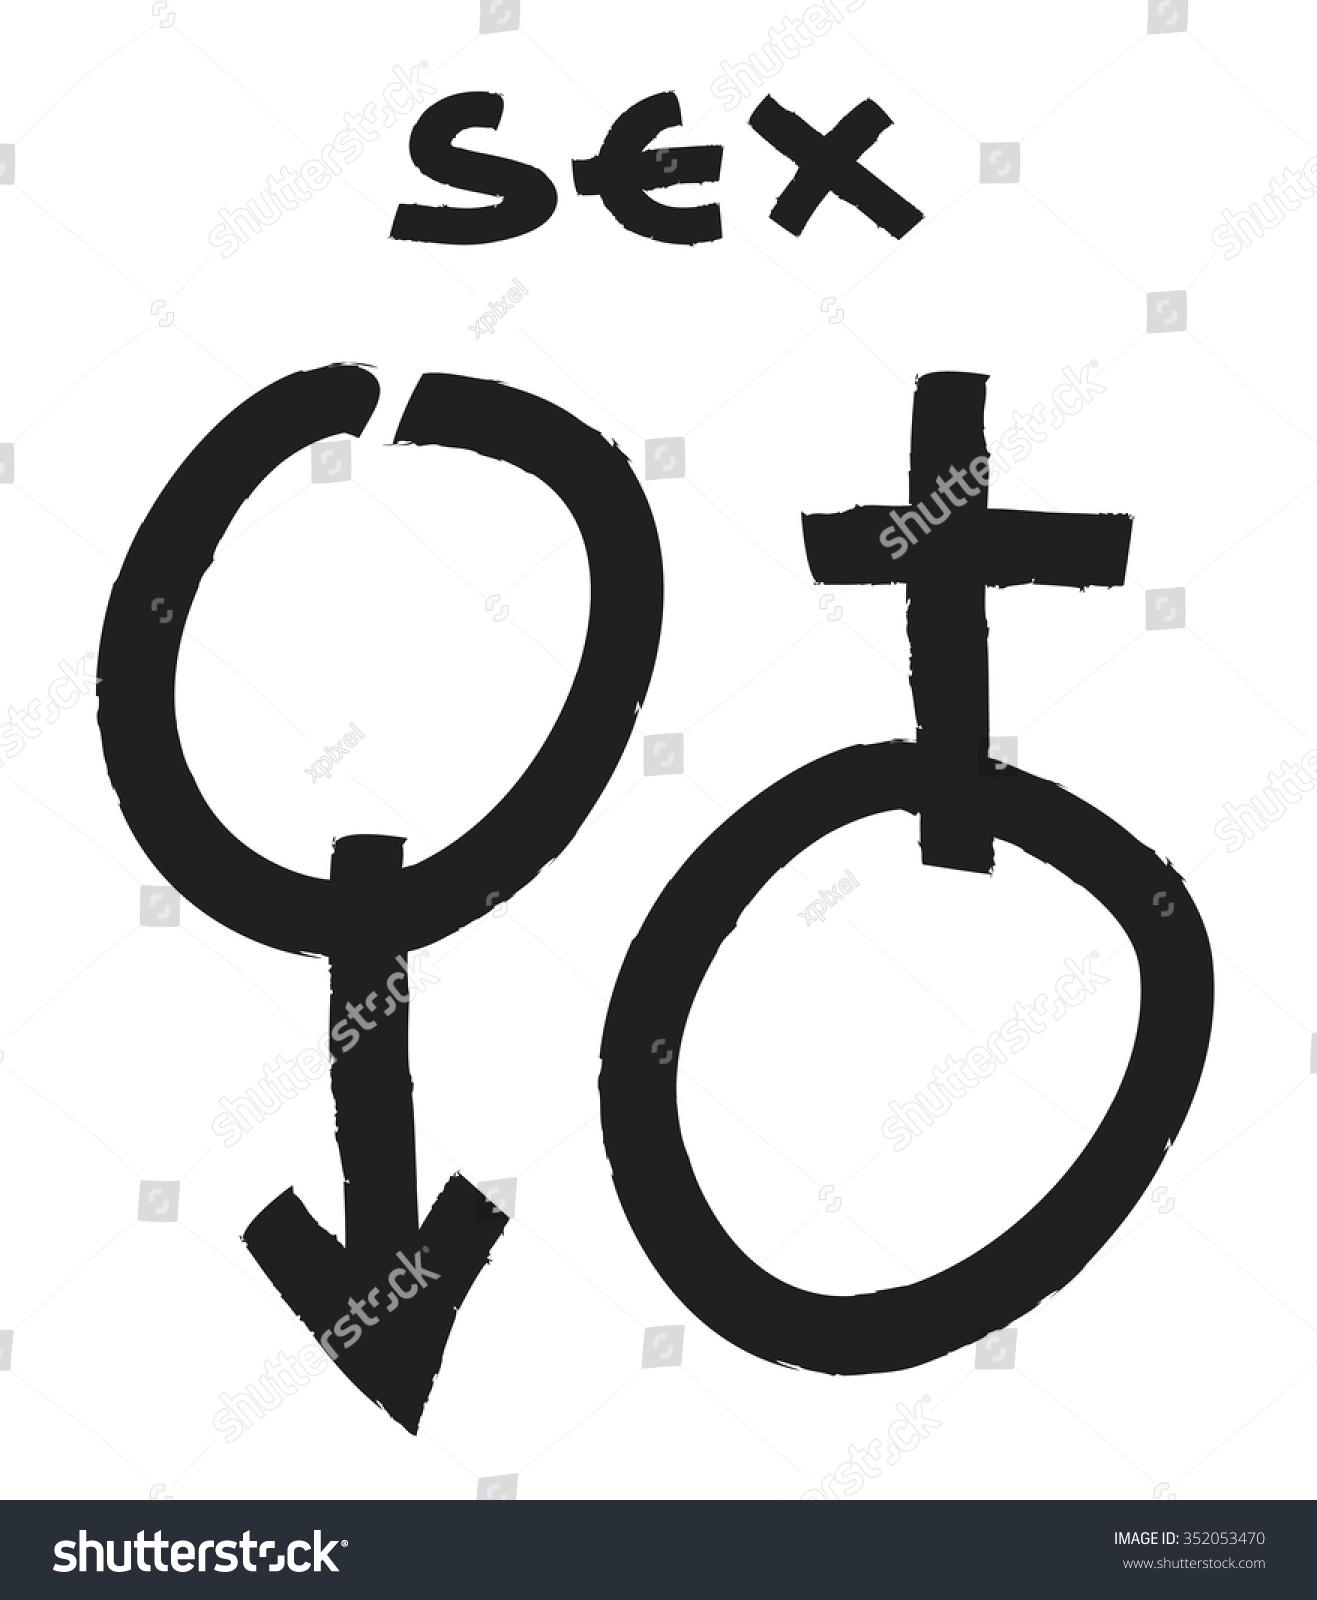 Male female symbols stock vector 352053470 shutterstock male and female symbols buycottarizona